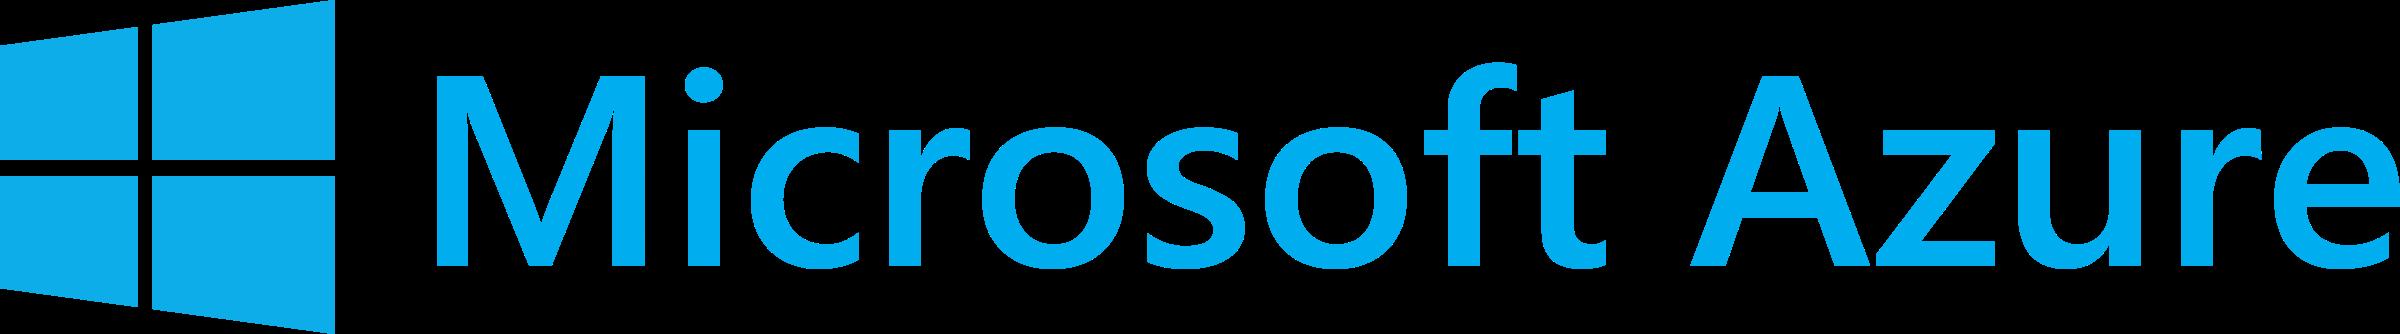 microsoft-azure-2-logo-png-transparent